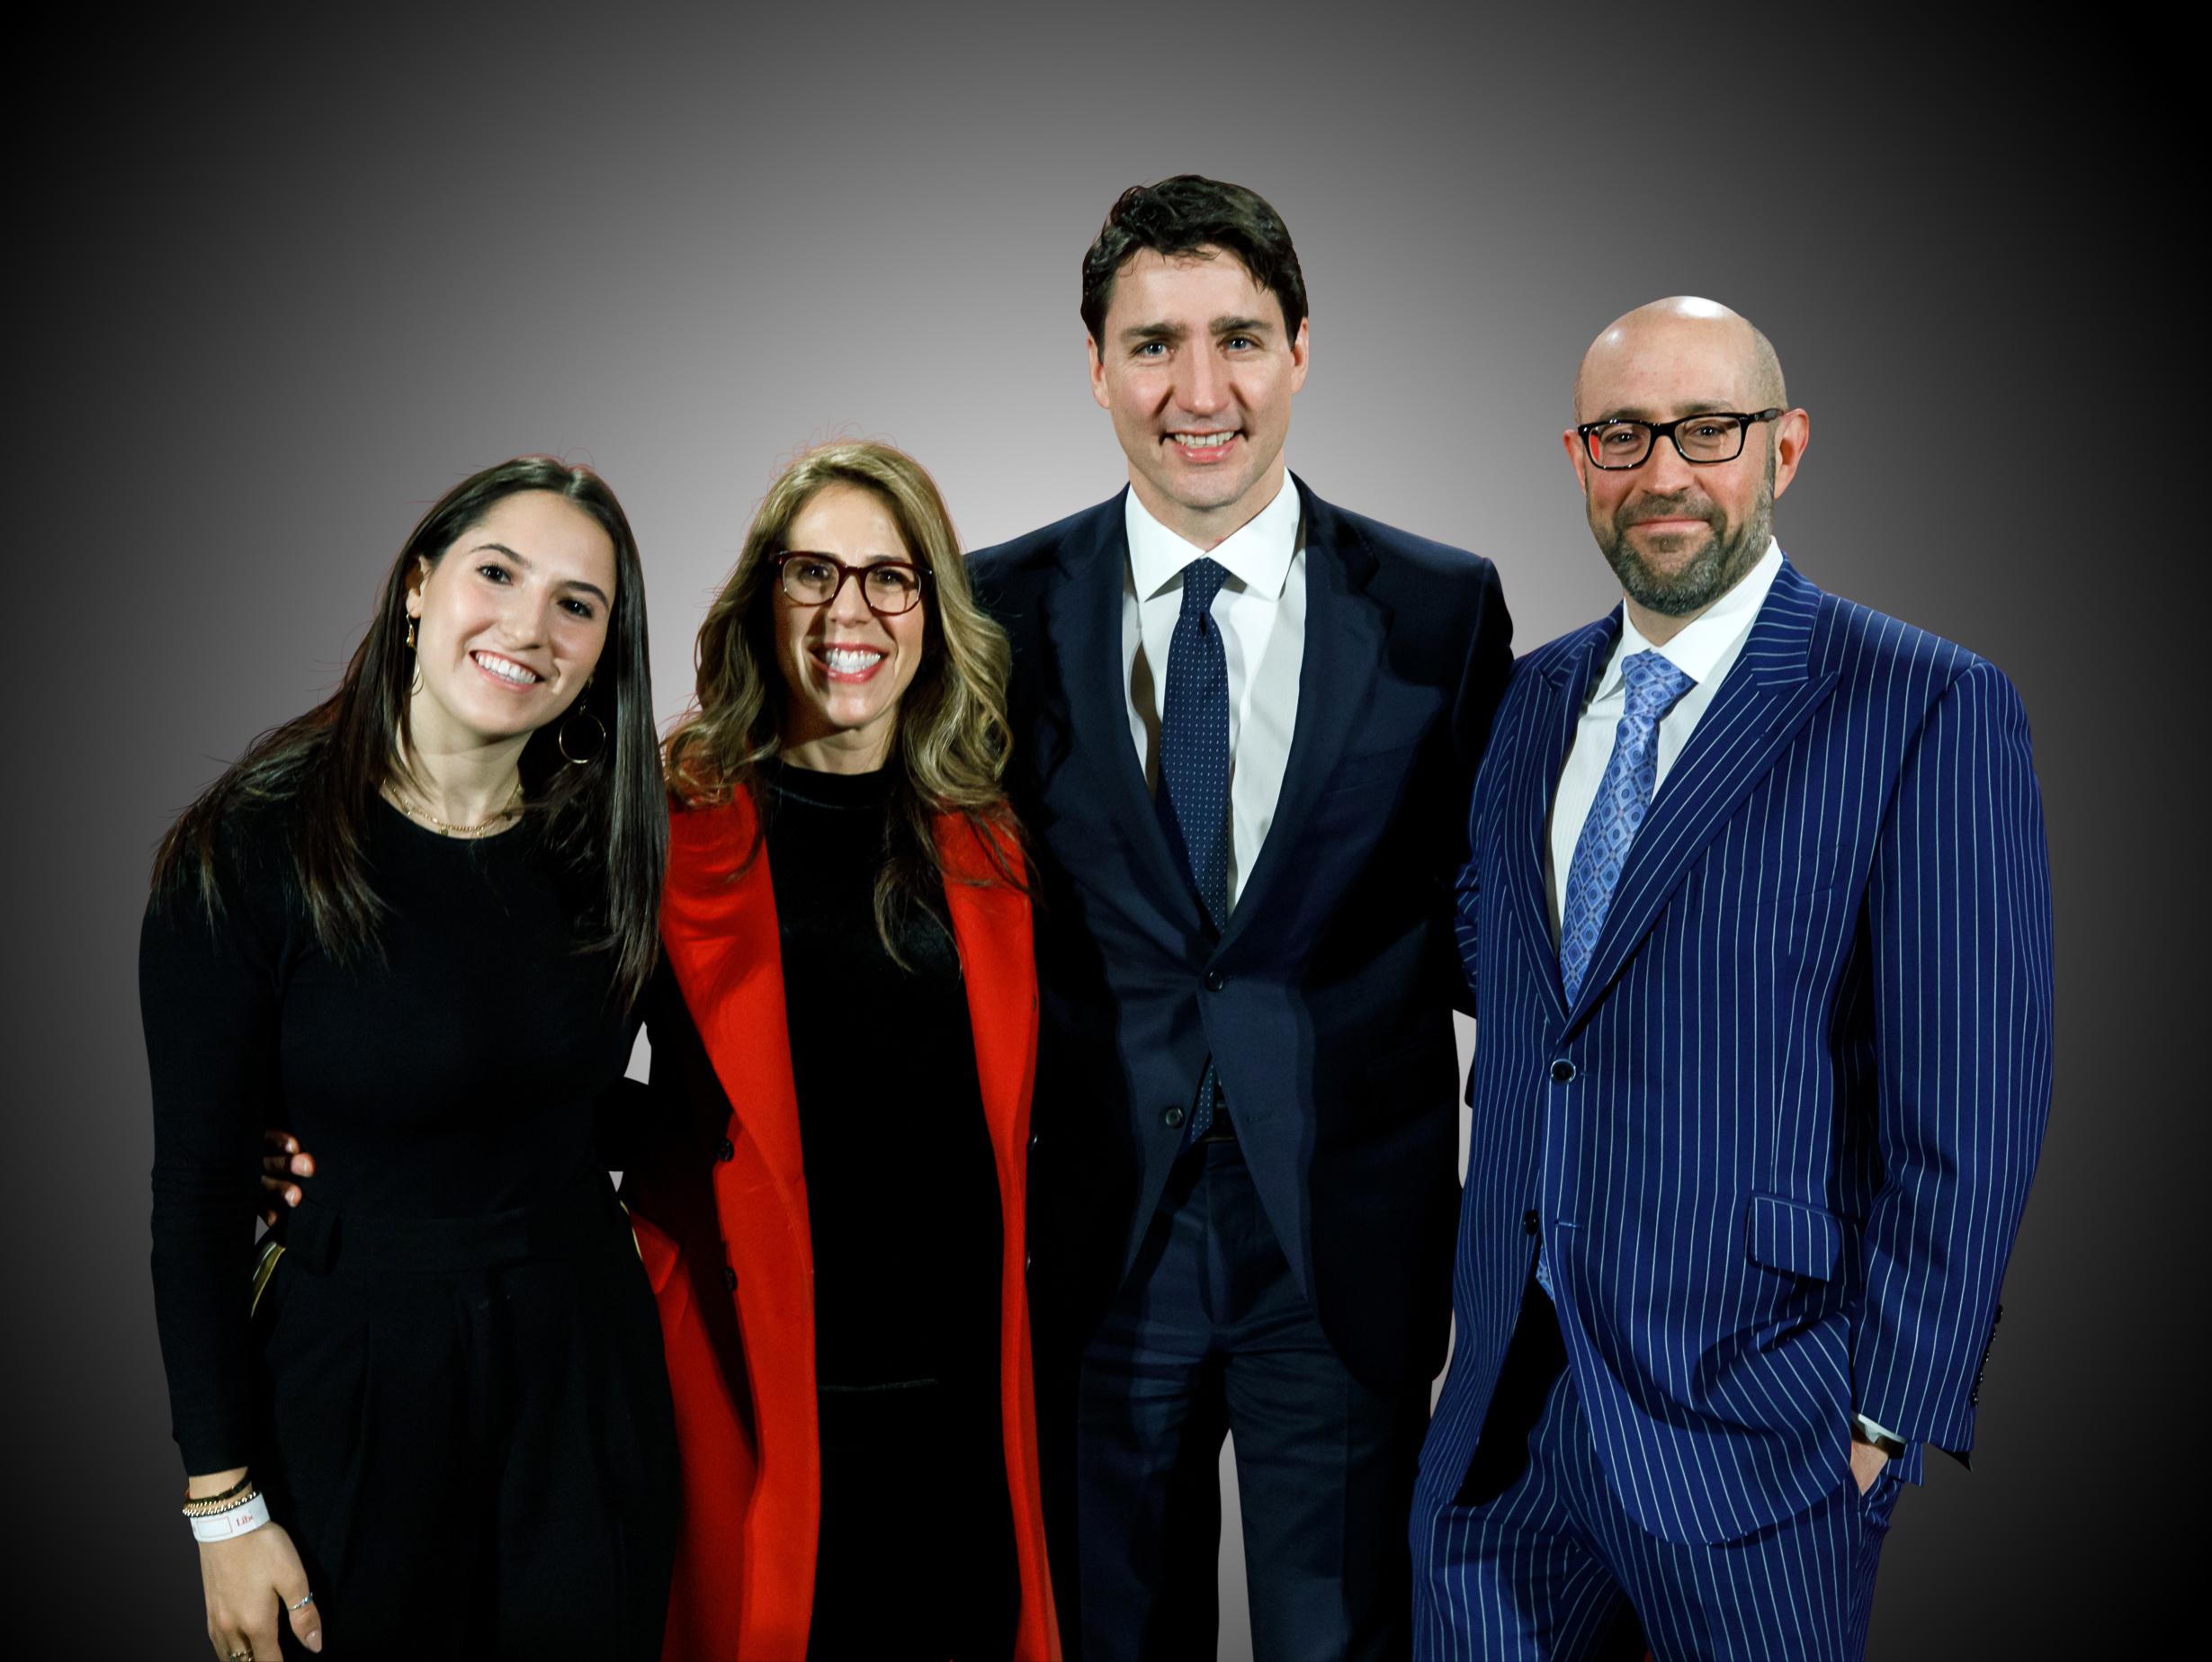 RCI - Justin Trudeau, Prime Minister of Canada, with Samantha Rosenzweig, Renee Rosenzweig, & Jay Rosenzweig - 20190211.JPG